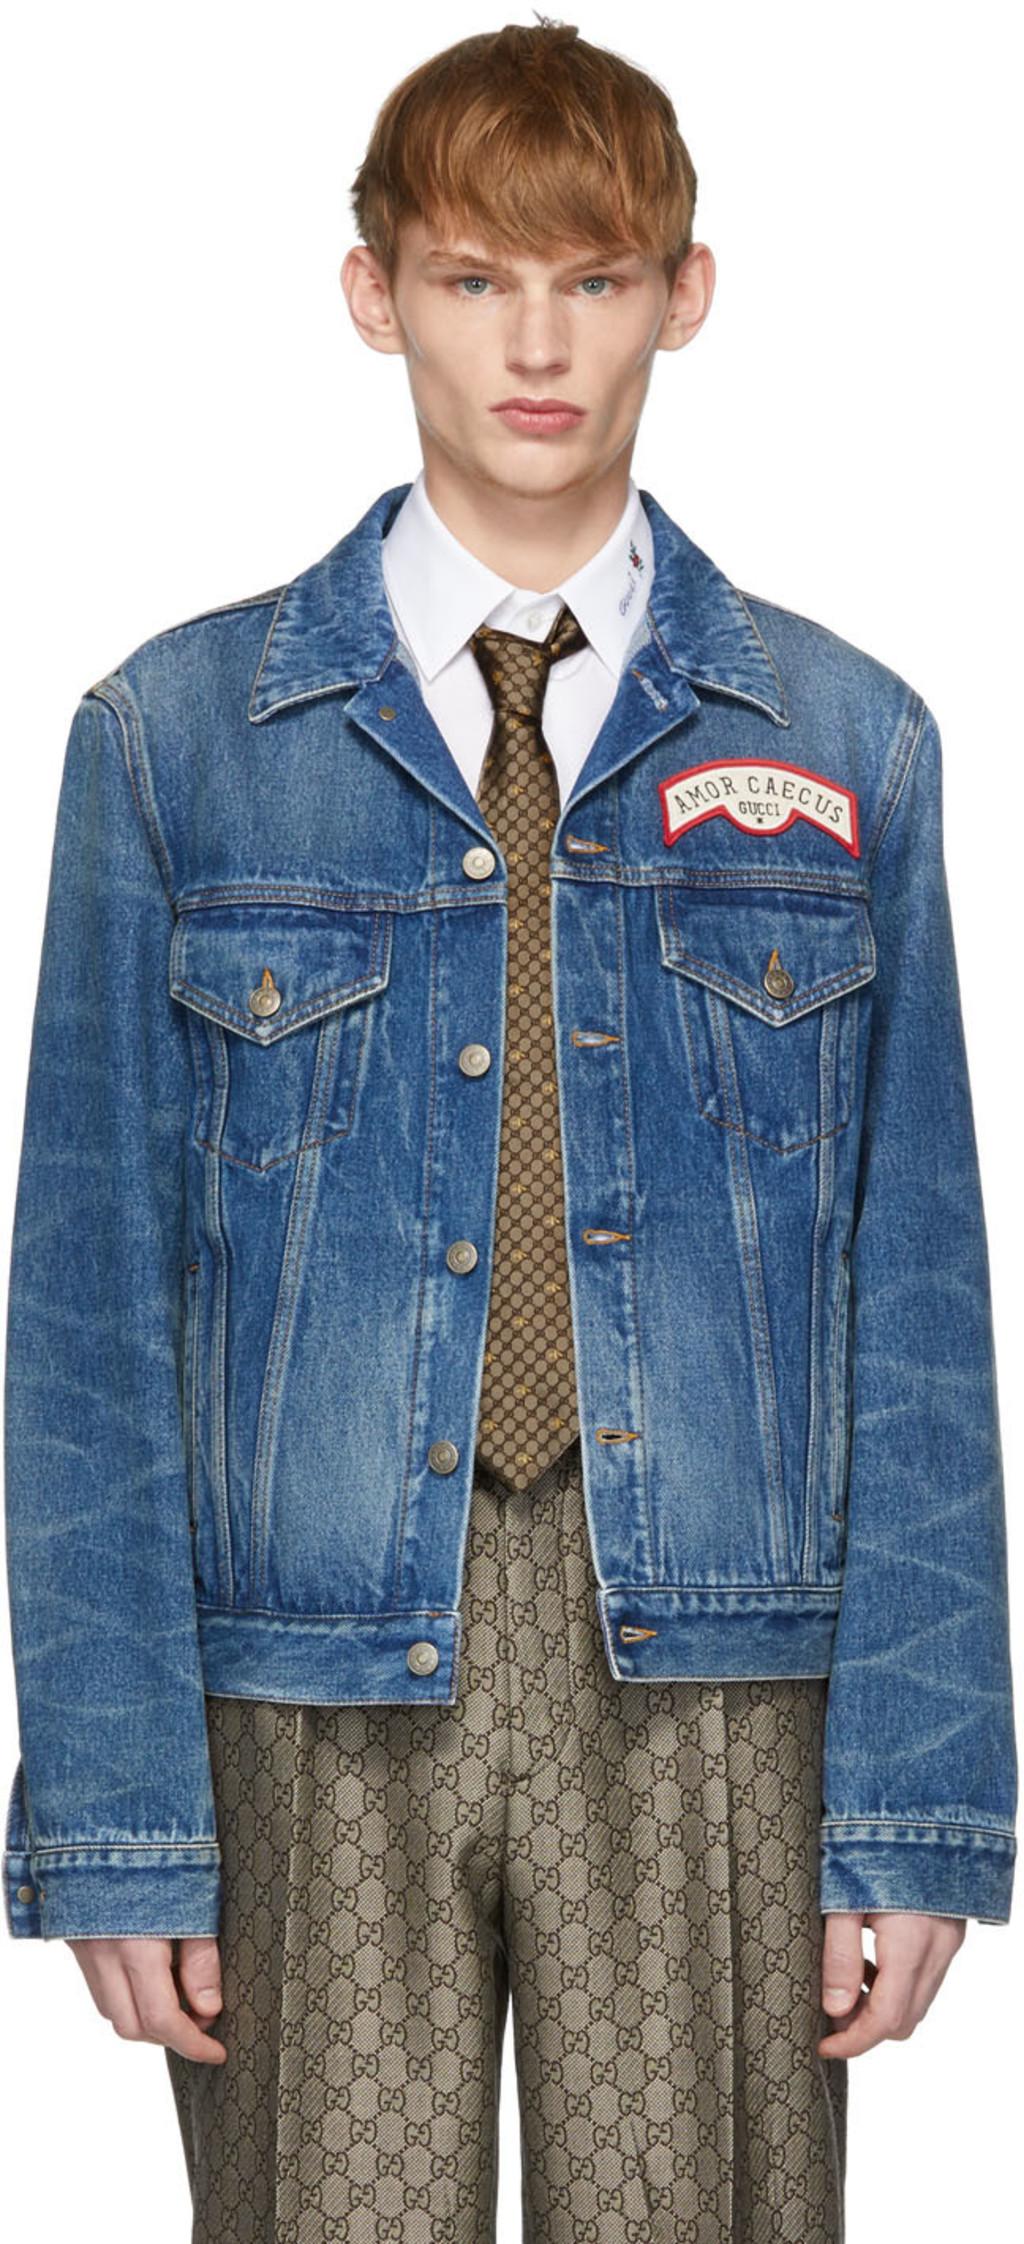 9b1eb7df2 Blue Denim Oversize Patches Jacket